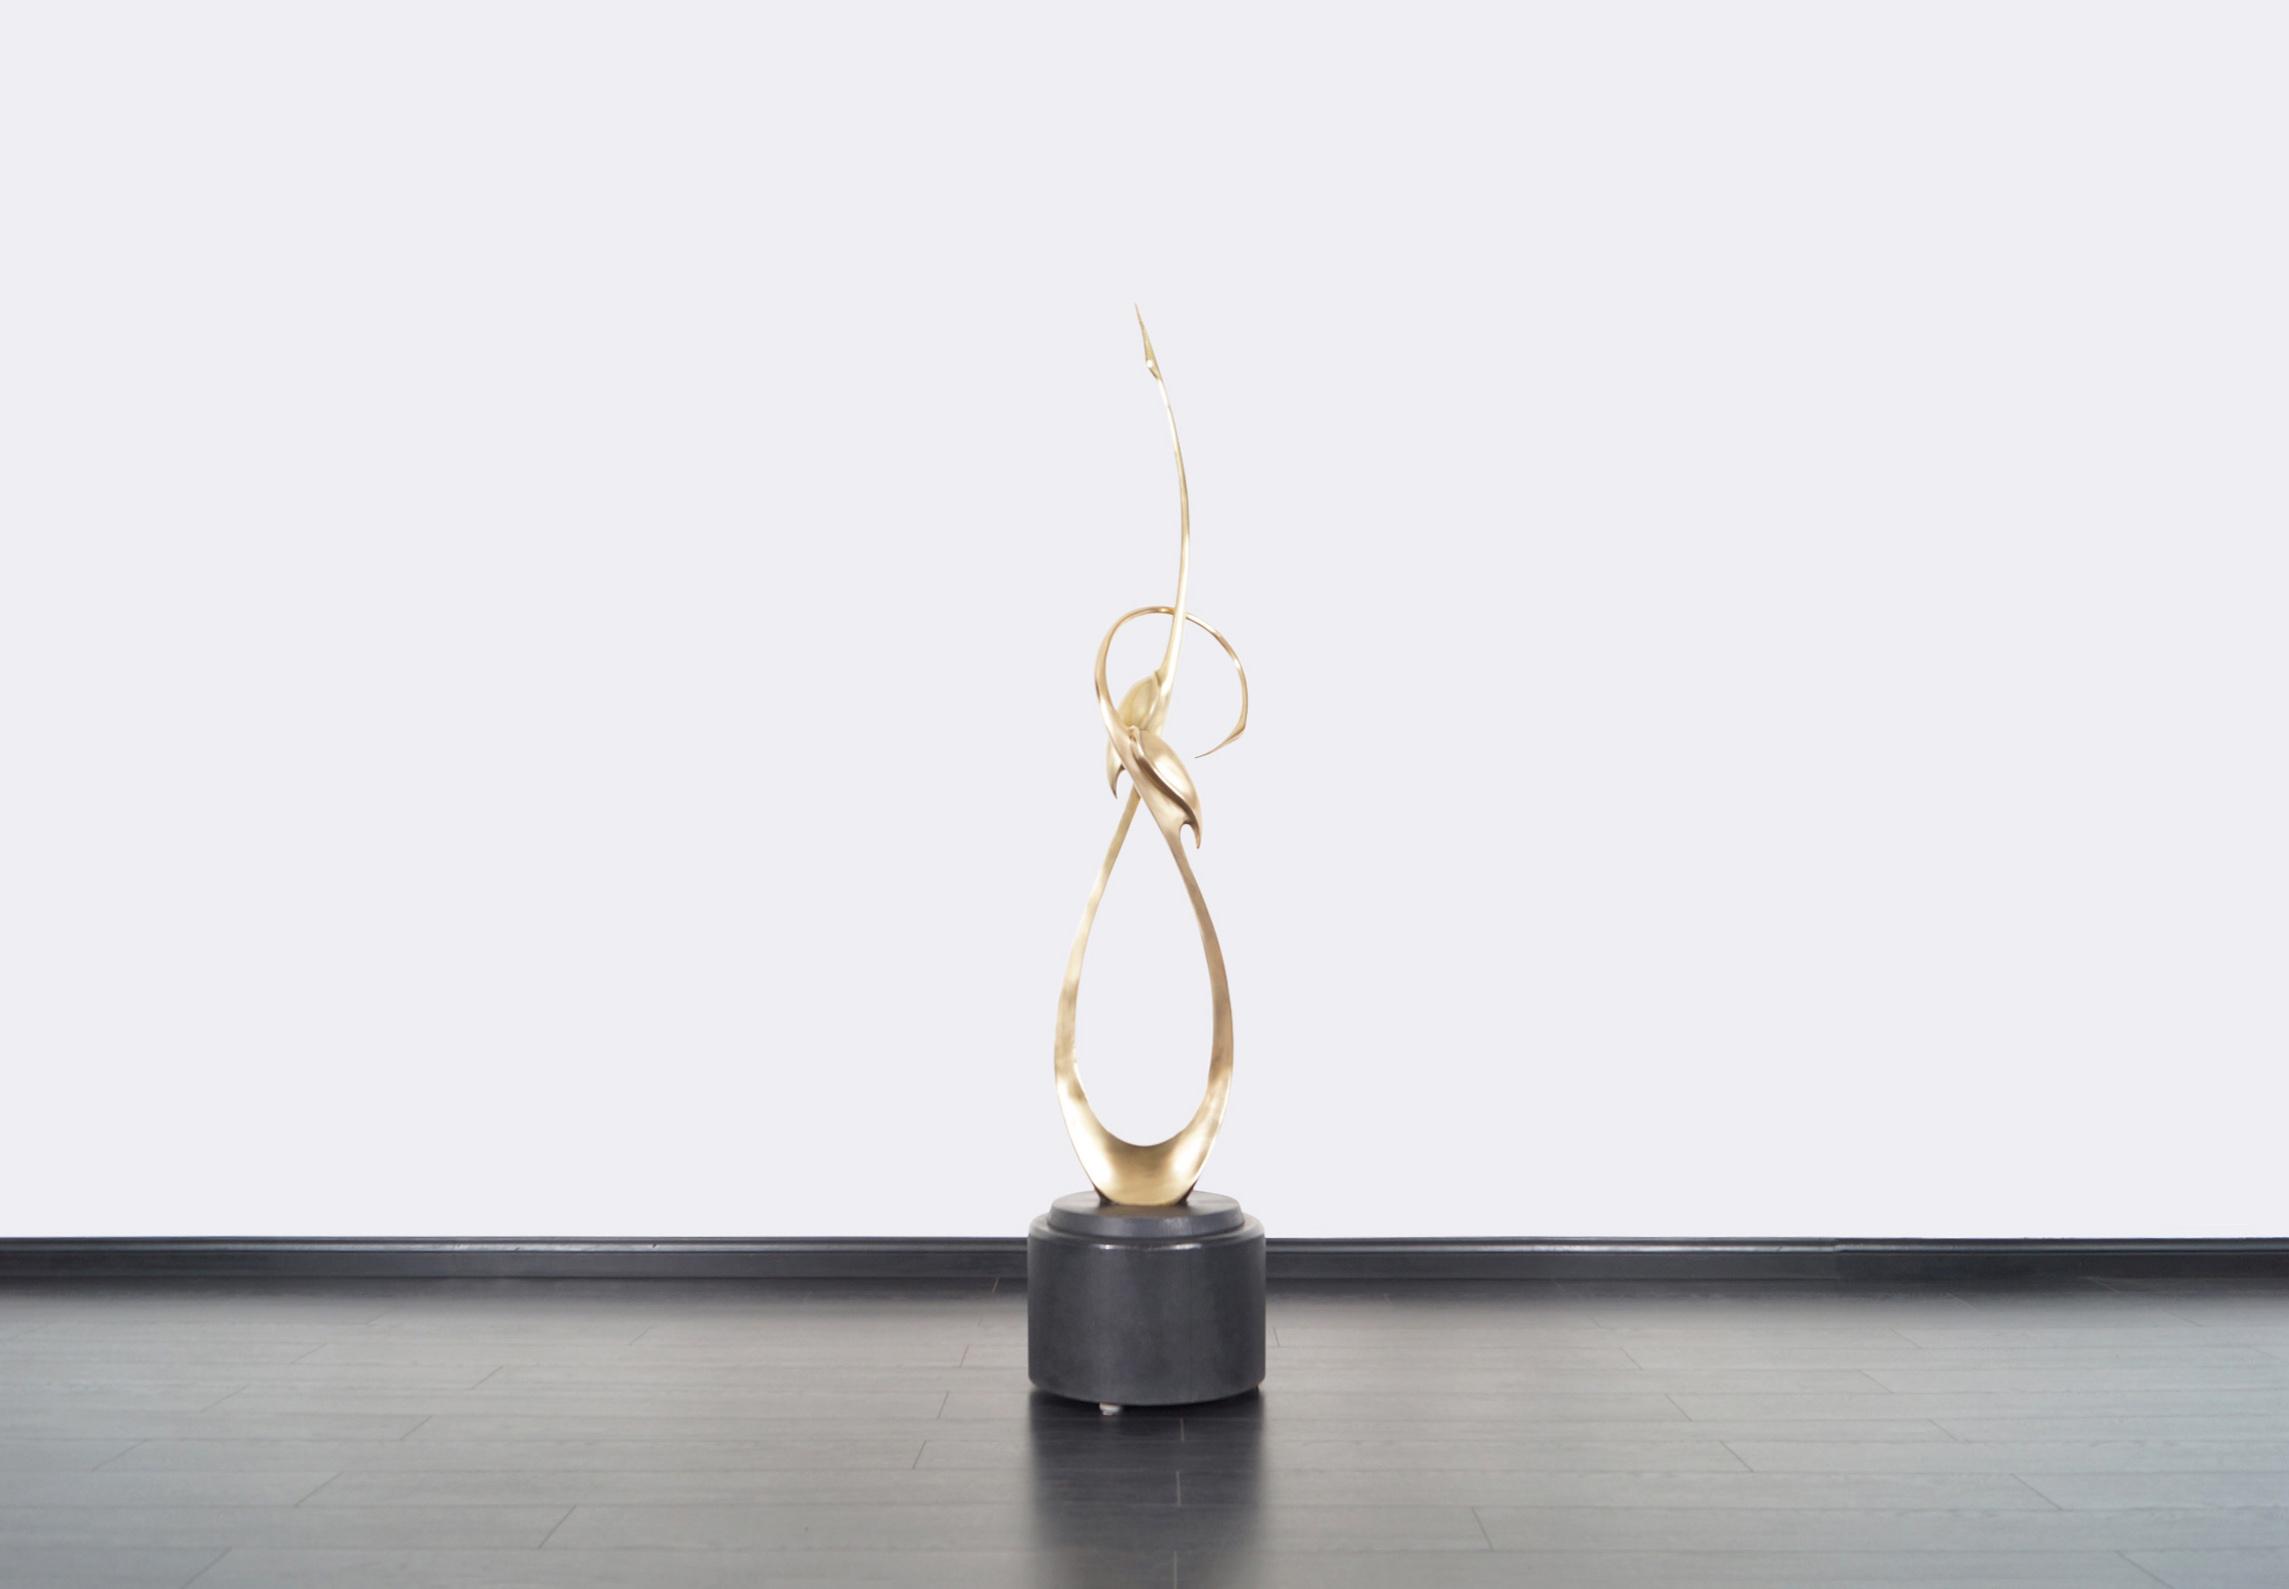 Vintage Life-Size Brass Entwined Cranes Sculpture by Boris Lovet-Lorski